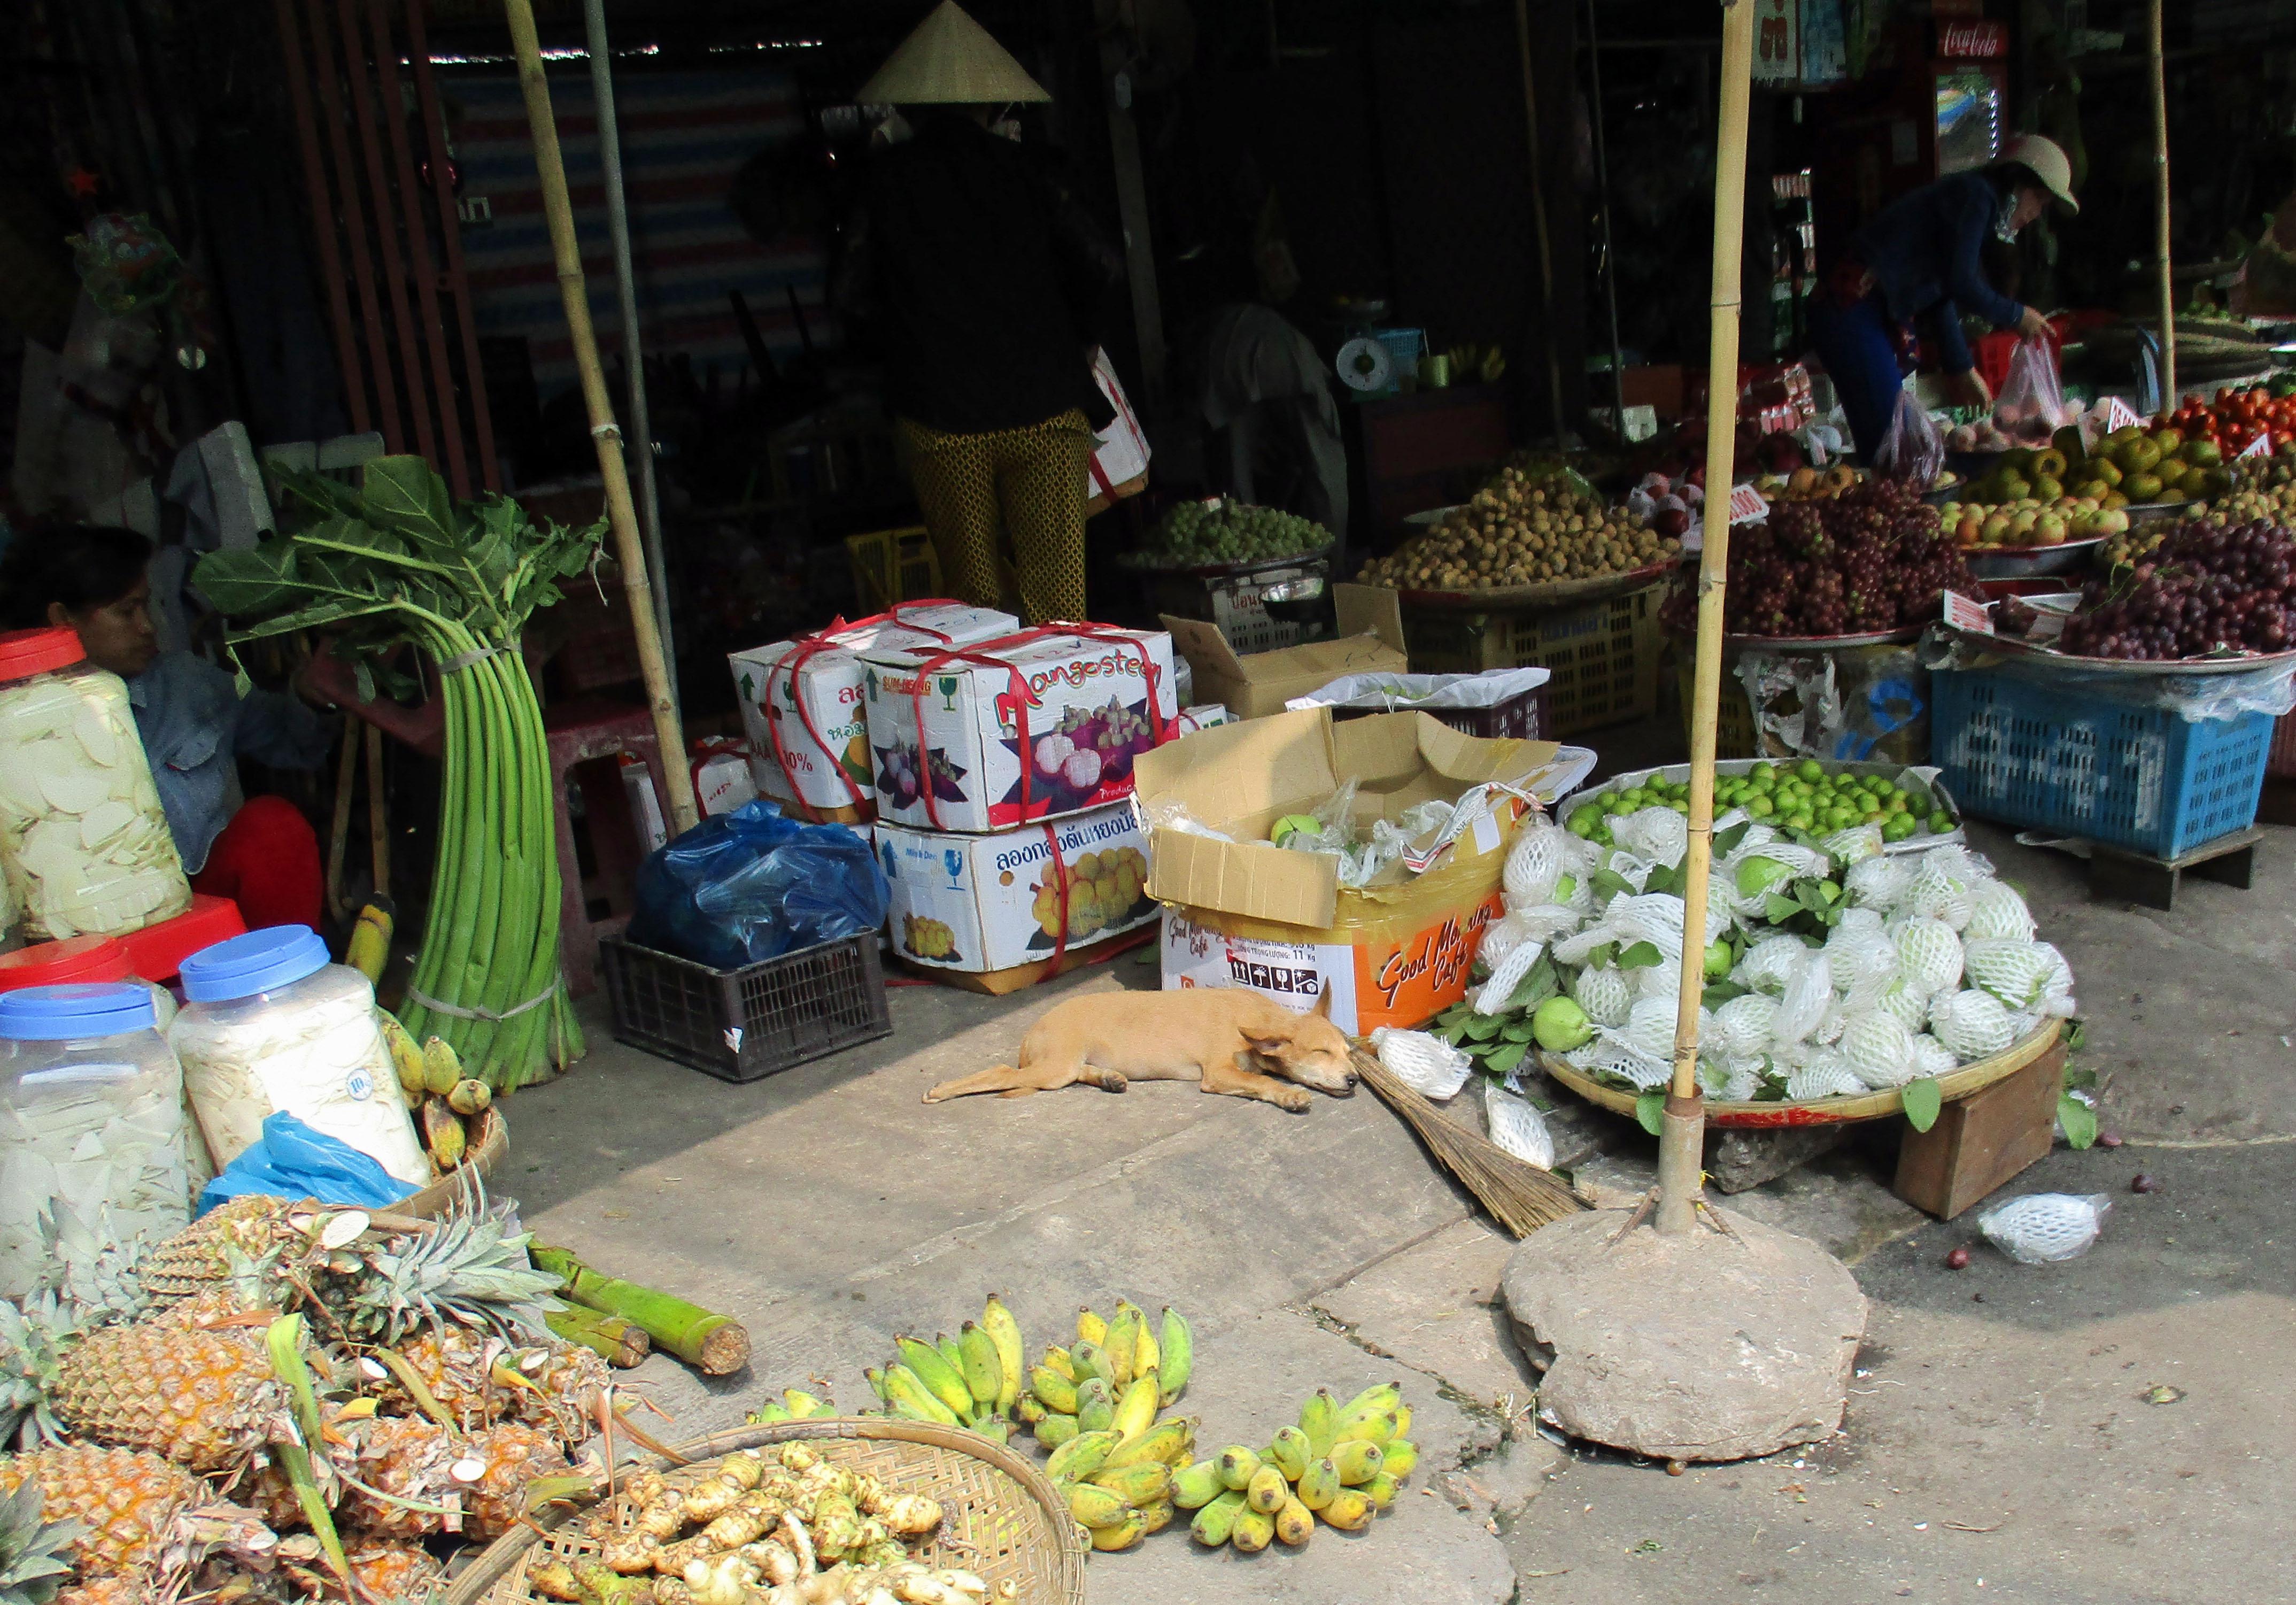 Dog sleeping at an outdoor market in Càu Mau.